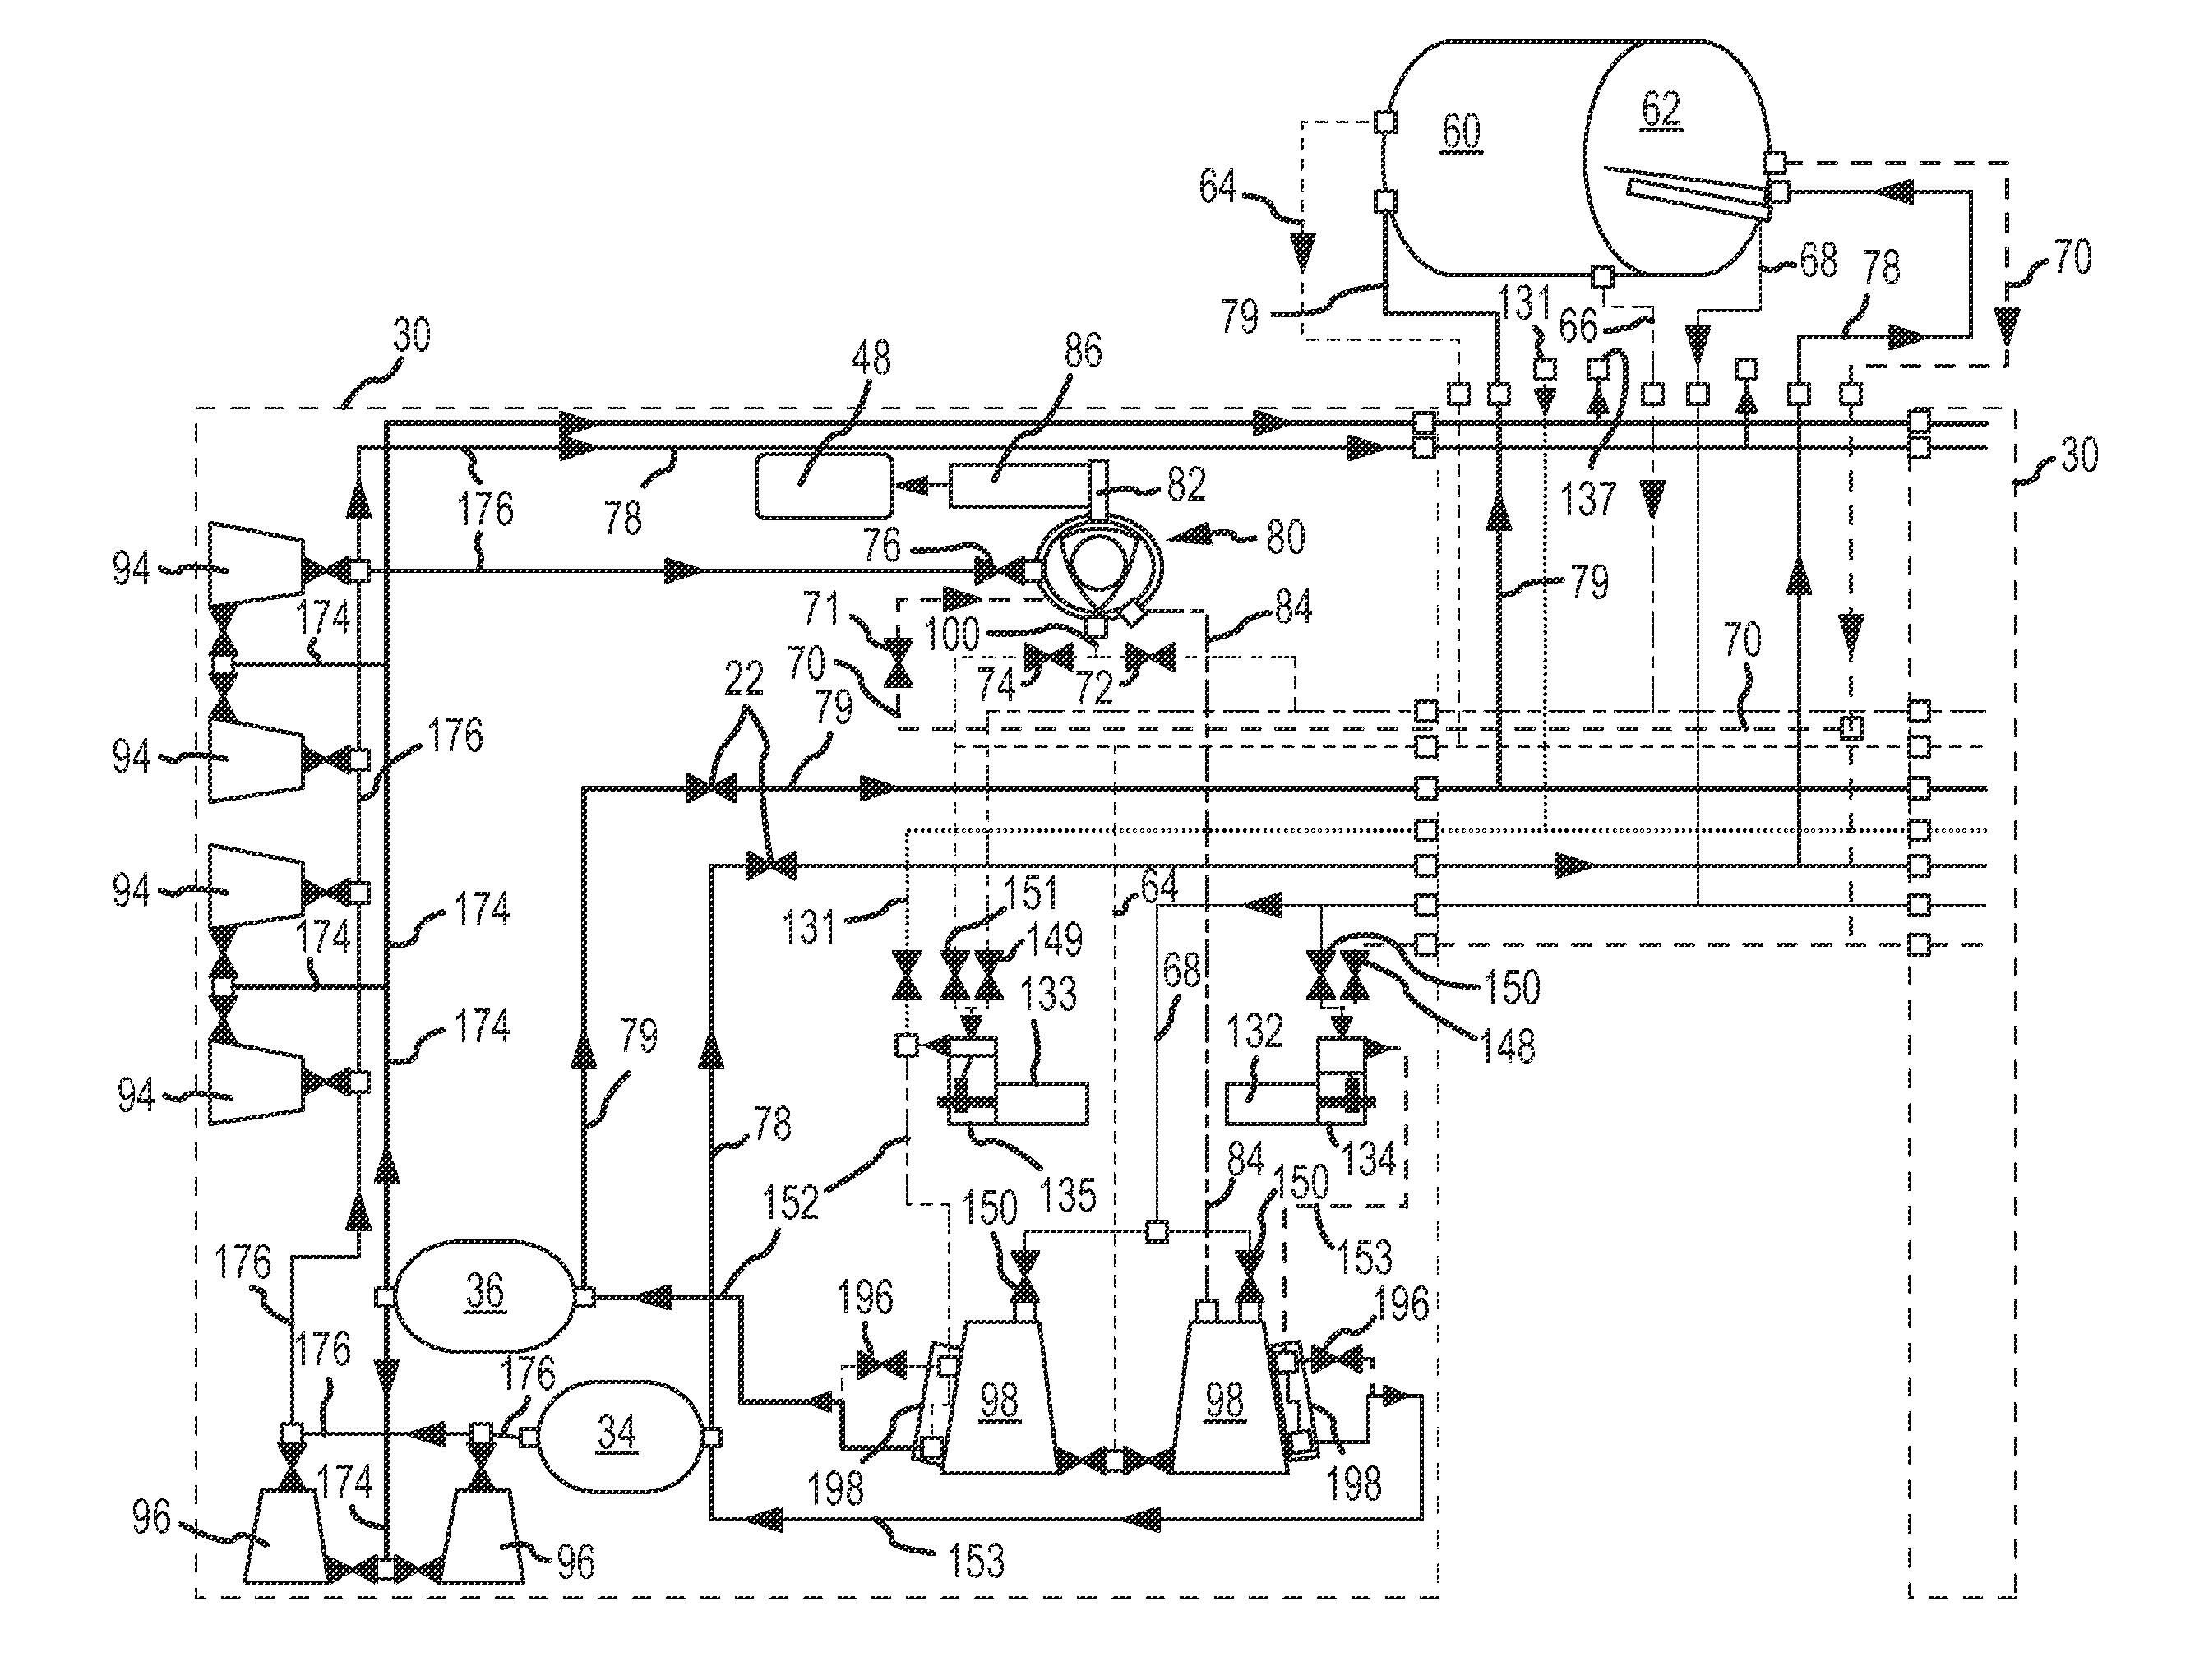 Rcs Actuator Wiring Diagram